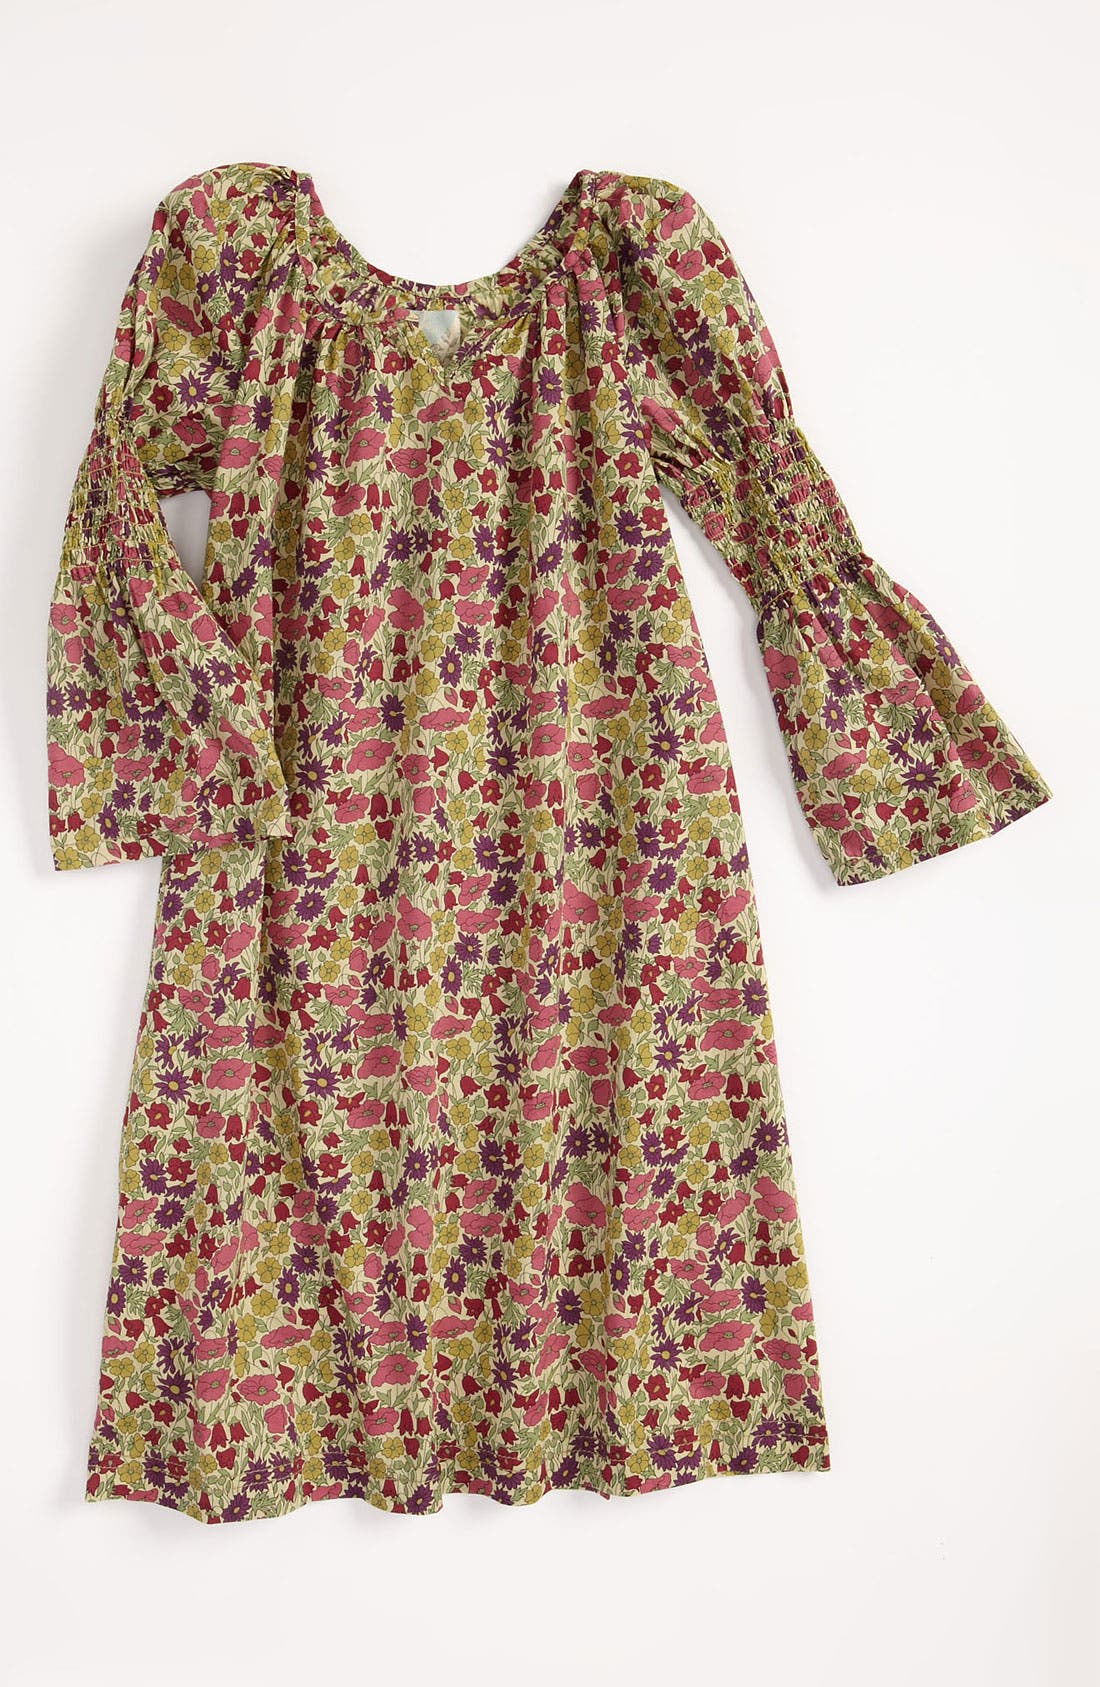 Alternate Image 1 Selected - Peek 'Blanche' Dress (Toddler, Little Girls & Big Girls)